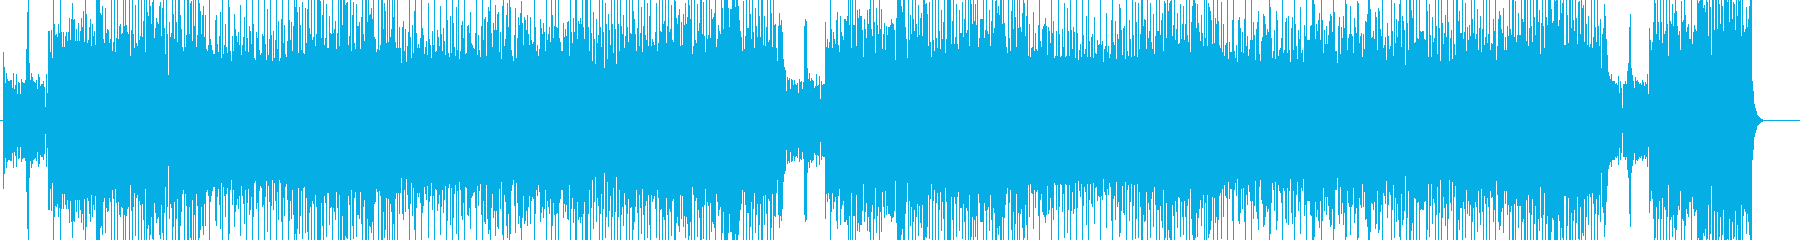 「HR/HM」「DARK」BGM156の再生済みの波形